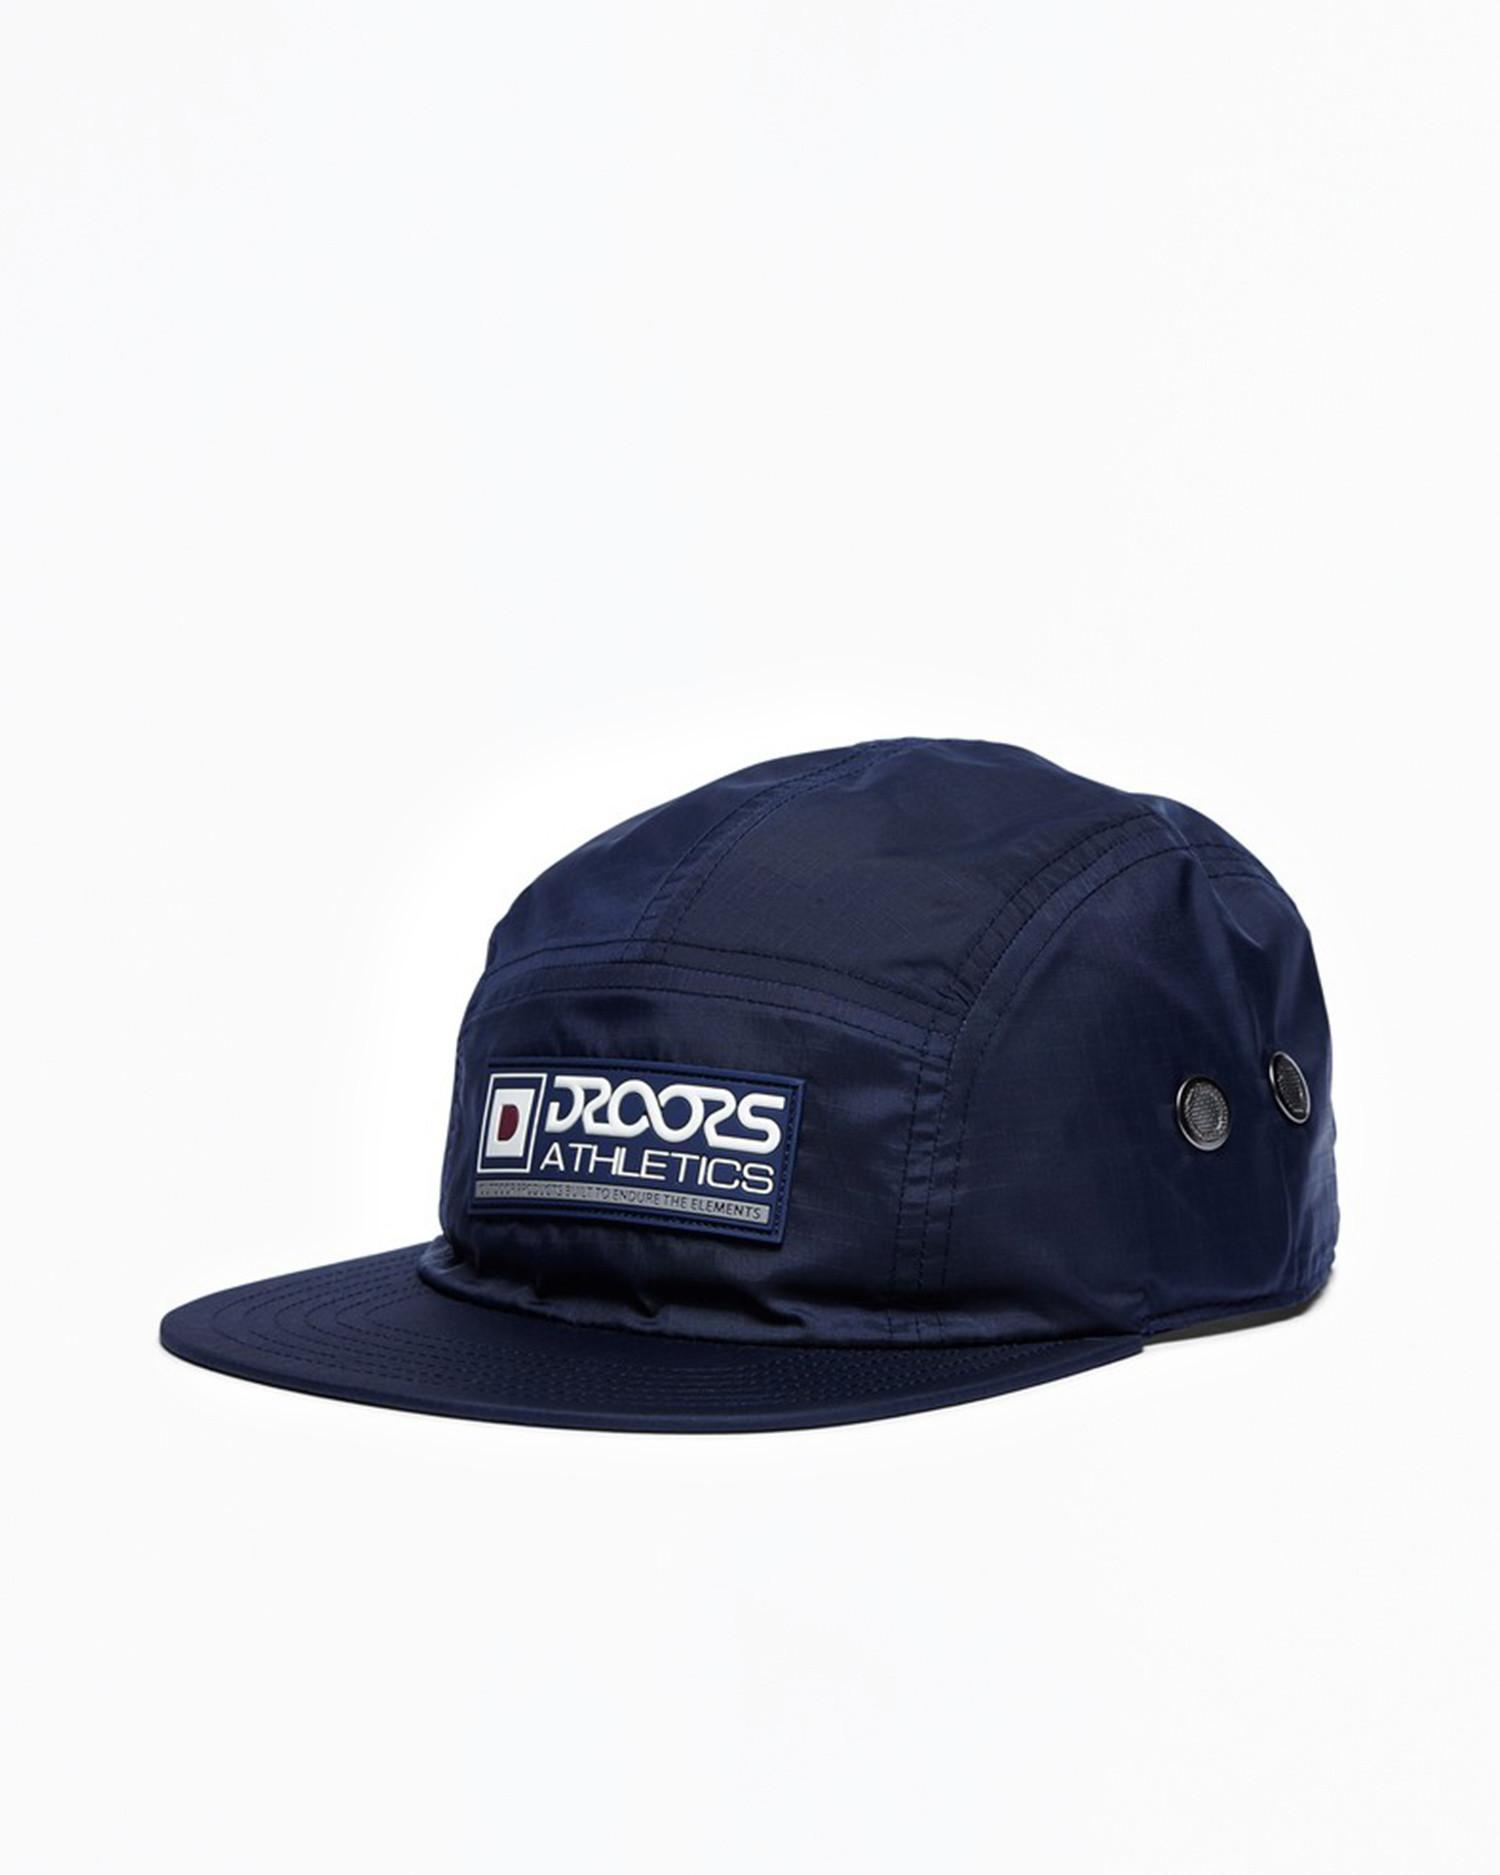 DROORS Infinity Camp Hat Navy